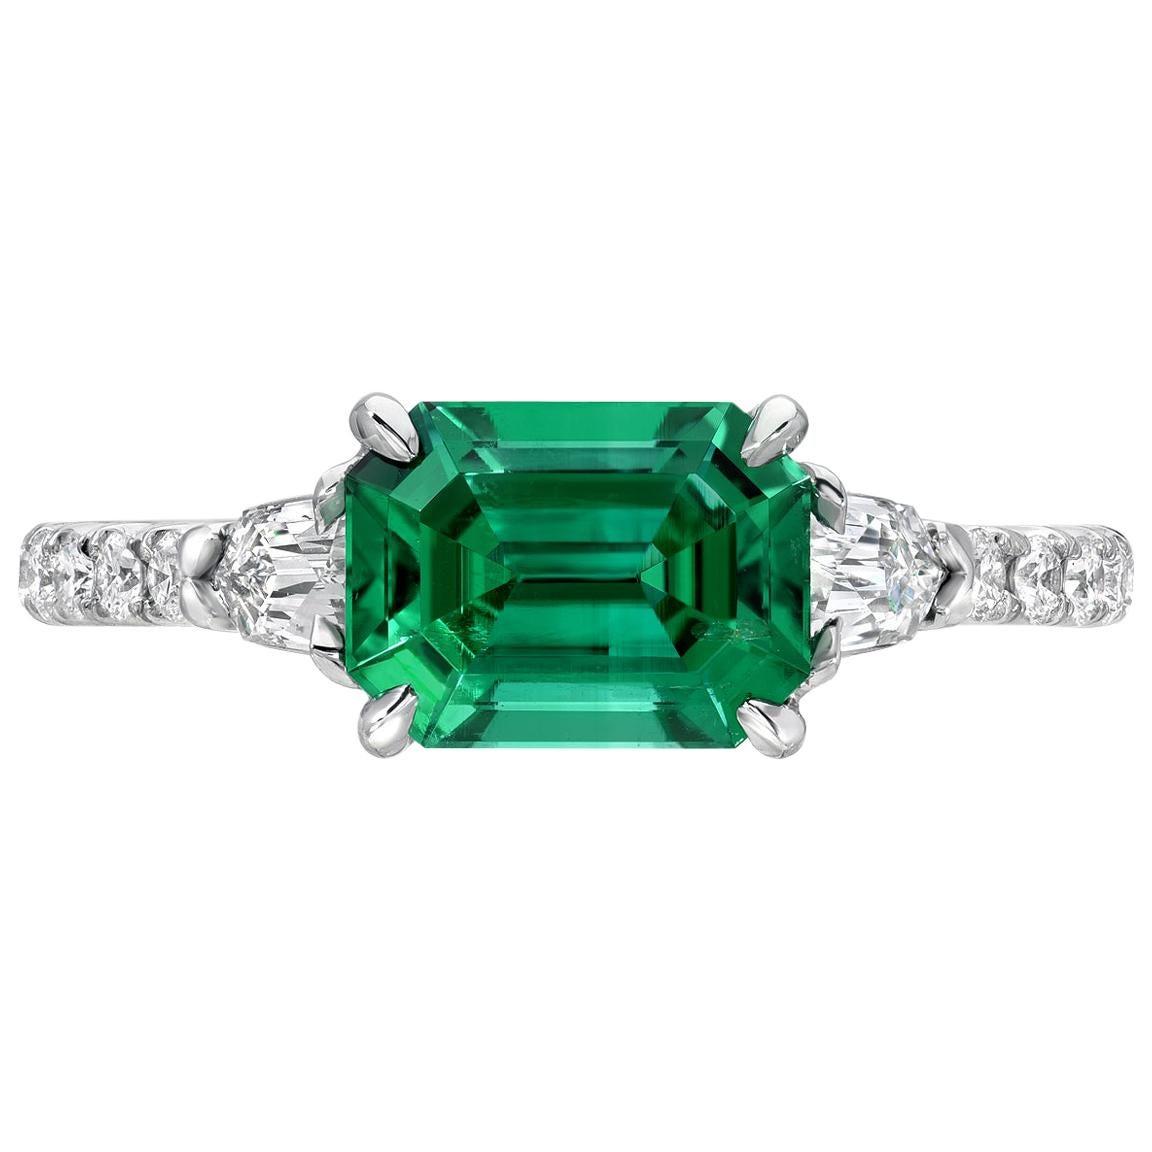 Untreated Emerald Ring 1.47 Carat No Oil AGL Certified Panjshir Afghanistan